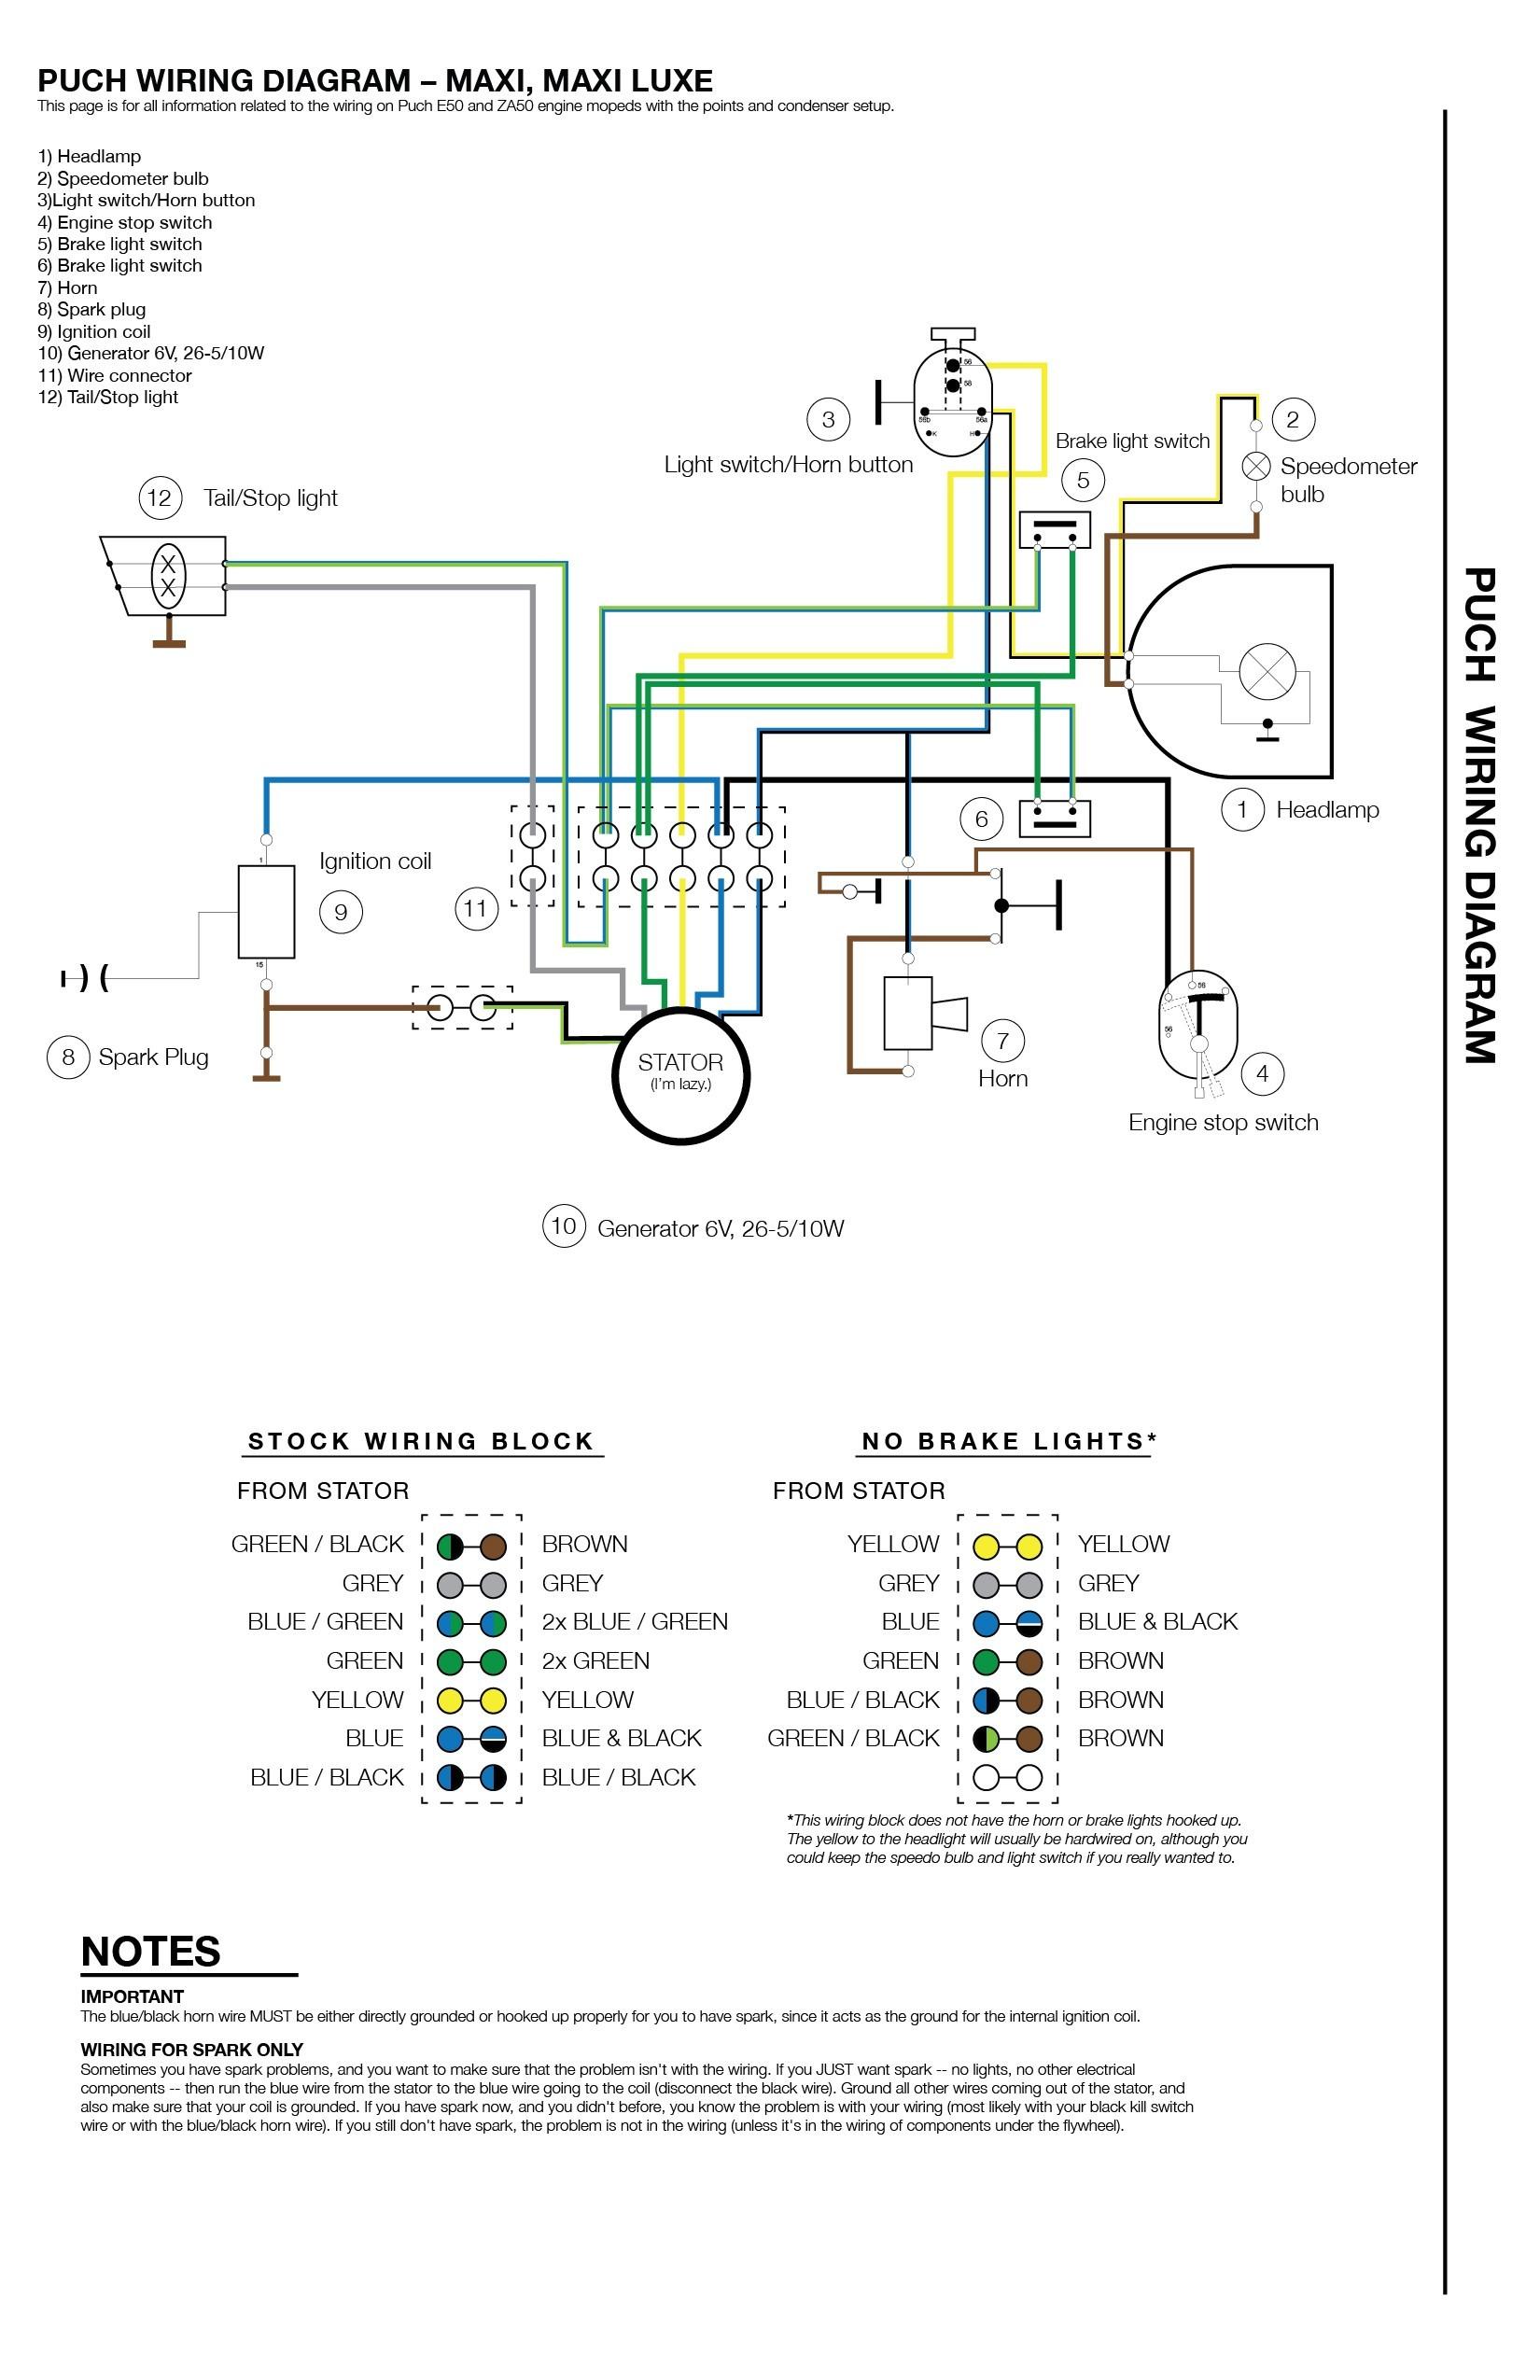 top hat trailer wiring diagram 2002 dodge ram 2003 3500 2006 radio harn wire harness